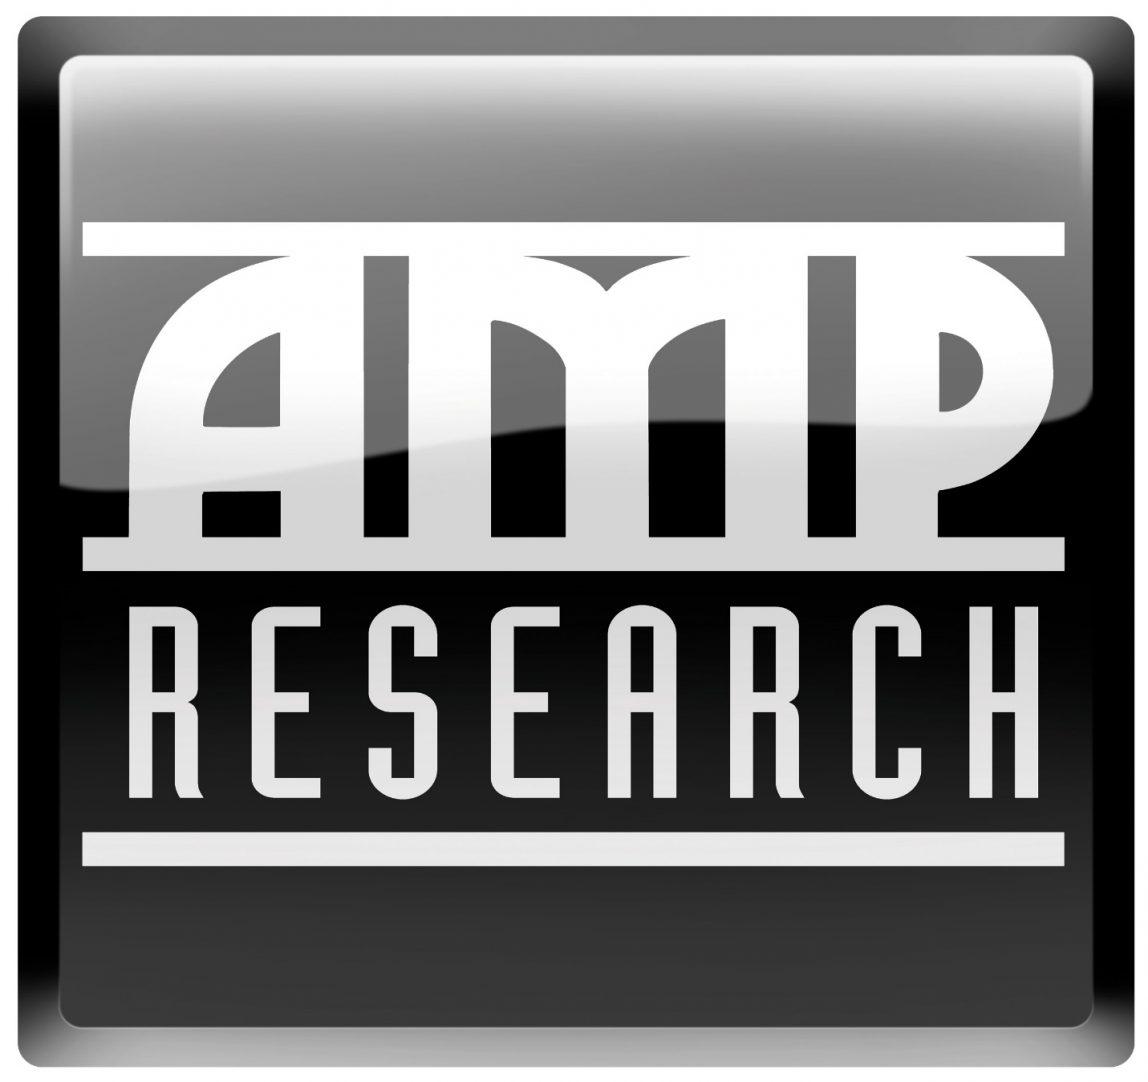 C:\Users\user\Desktop\ALEX\Manufacturers\AMP Research Logo.jpg